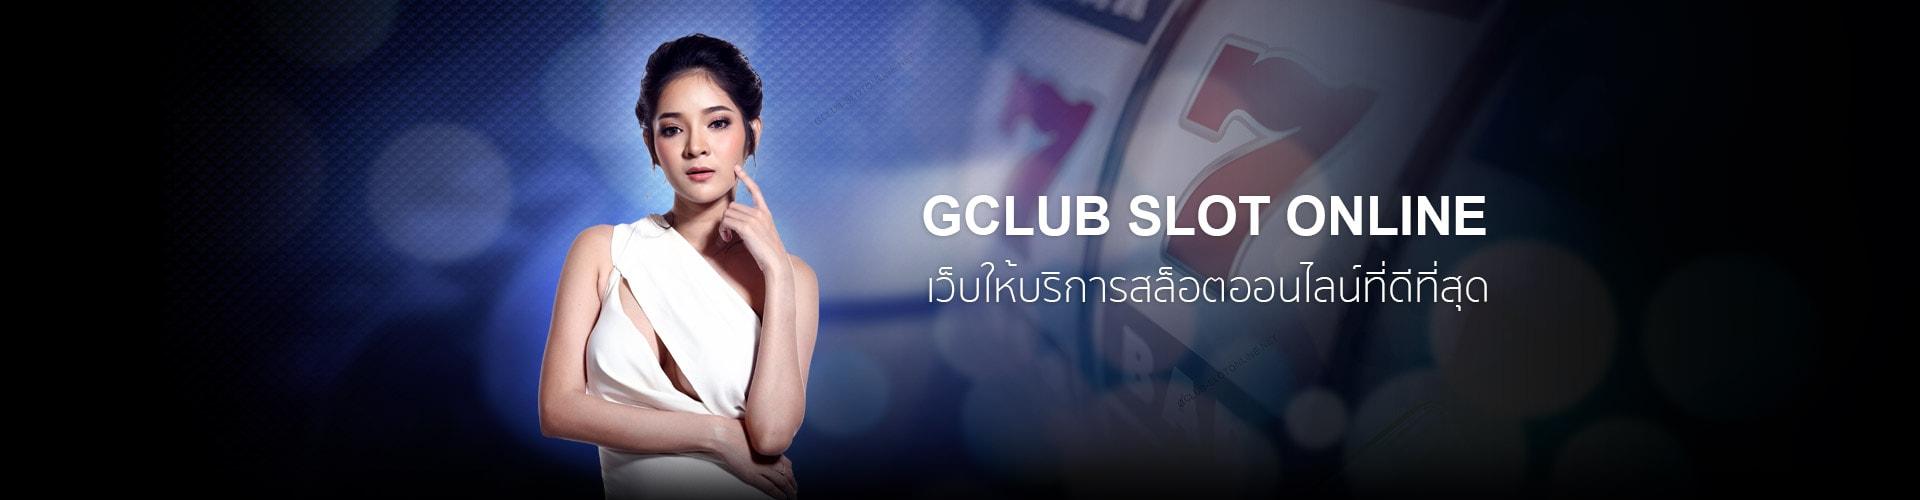 gclub slot online games